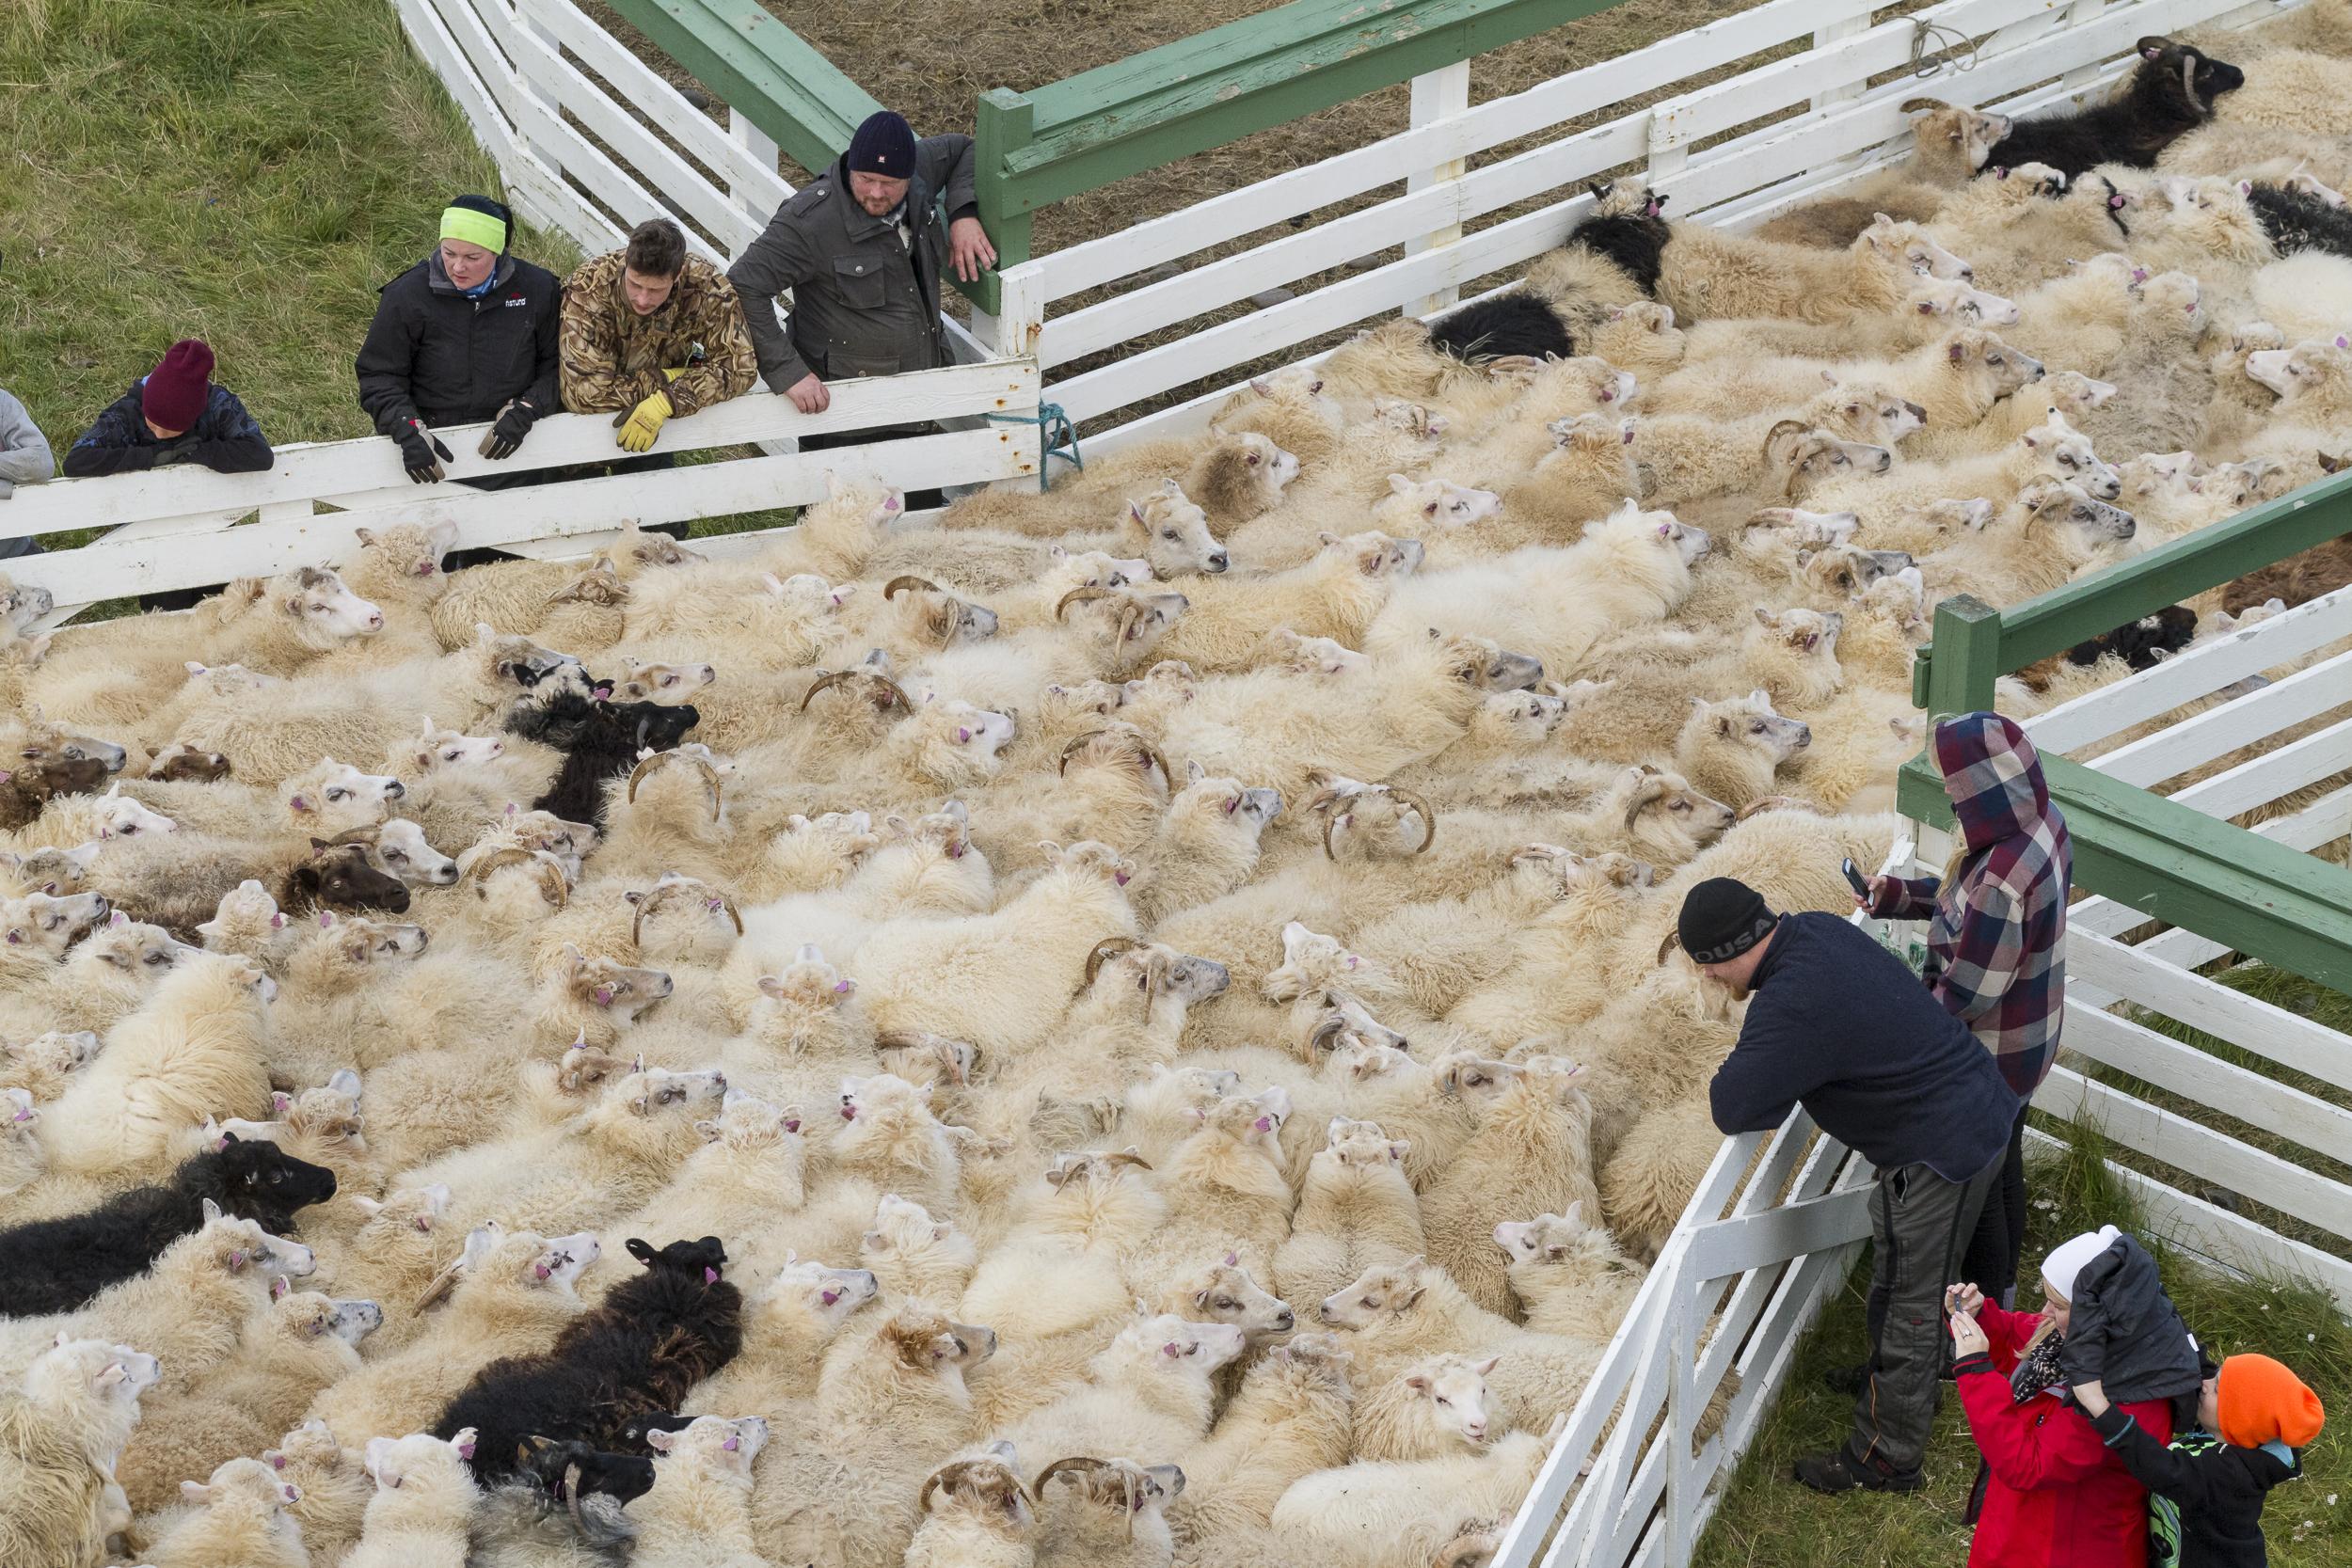 Sheep_005